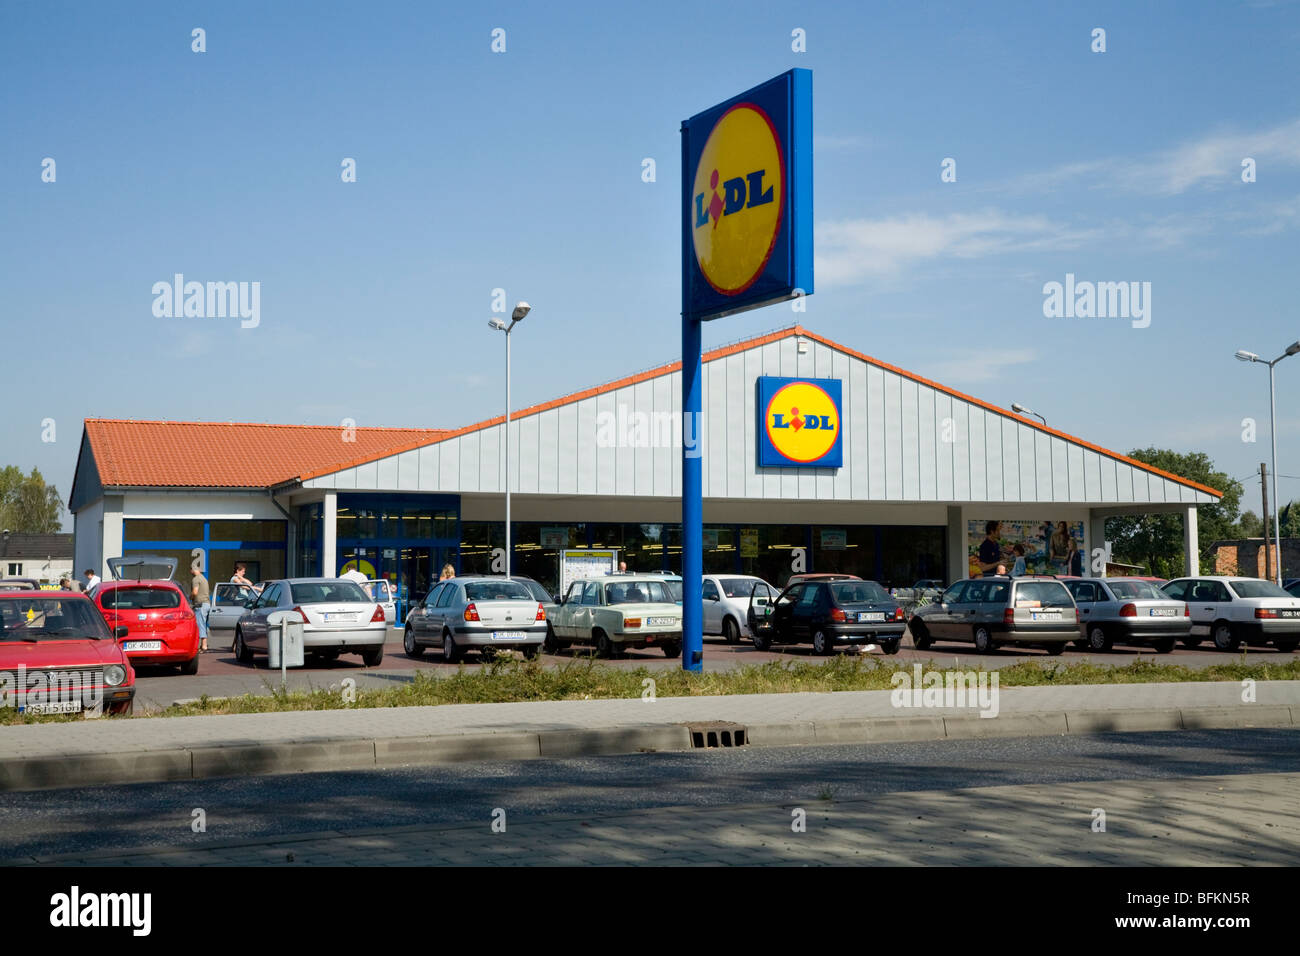 Lidl supermarket on a Polish road, in the town of Kedzierzyn-Kozle Stock Photo: 26863923 - Alamy